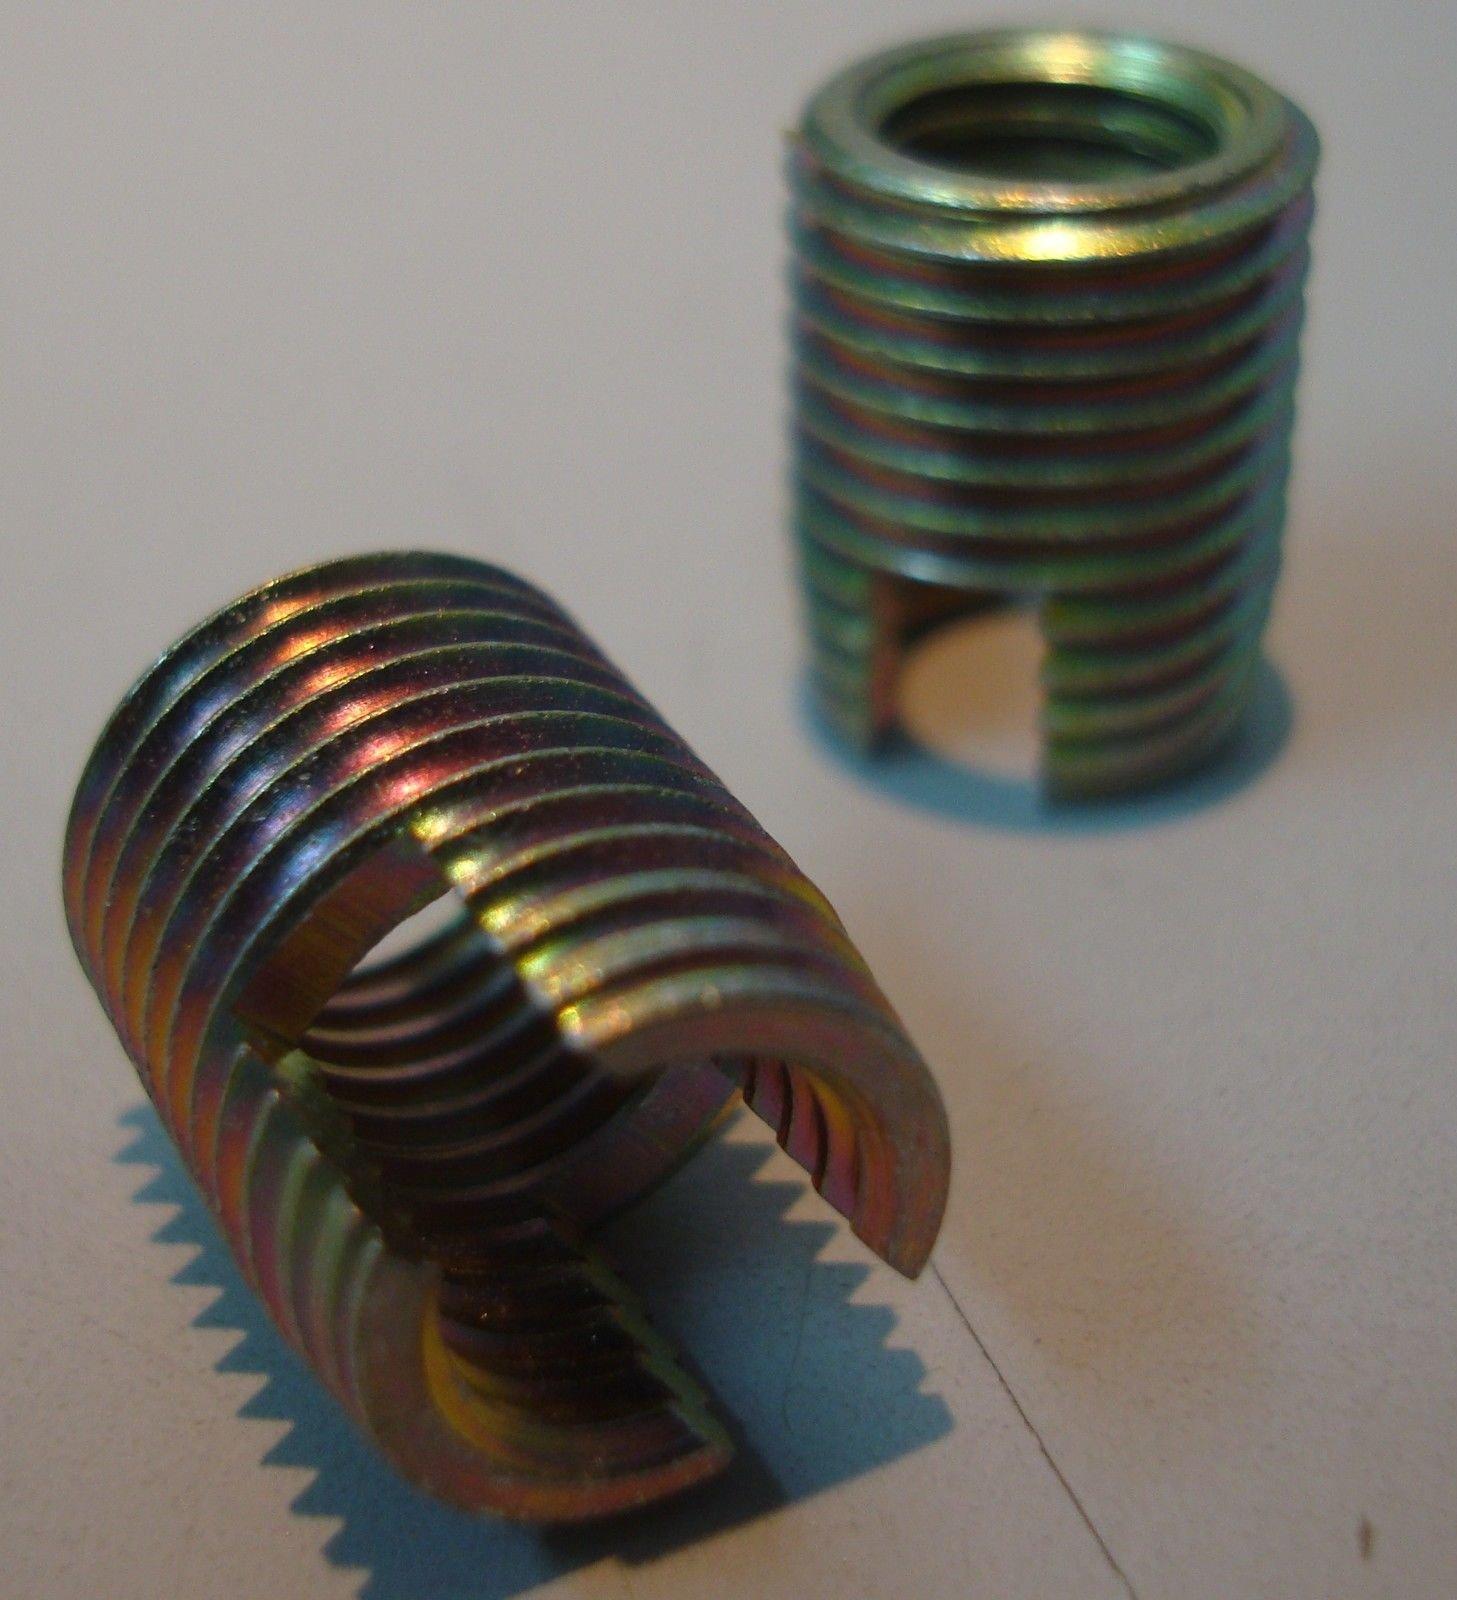 New Damaged Thread Repair Steel Insert - NC 1/4''-20 - 10 pcs Set